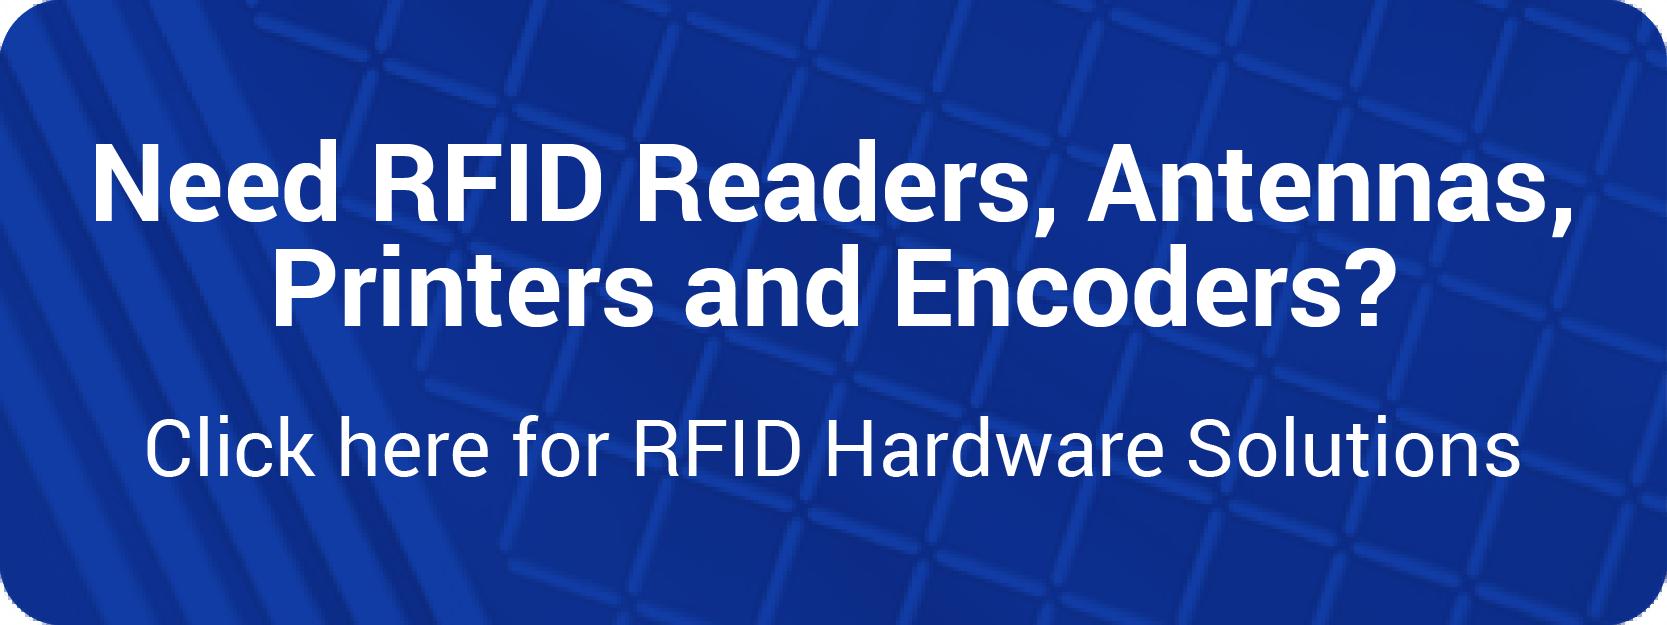 Need RFID Readers, Antennas, Printers and Encoders? Click Here